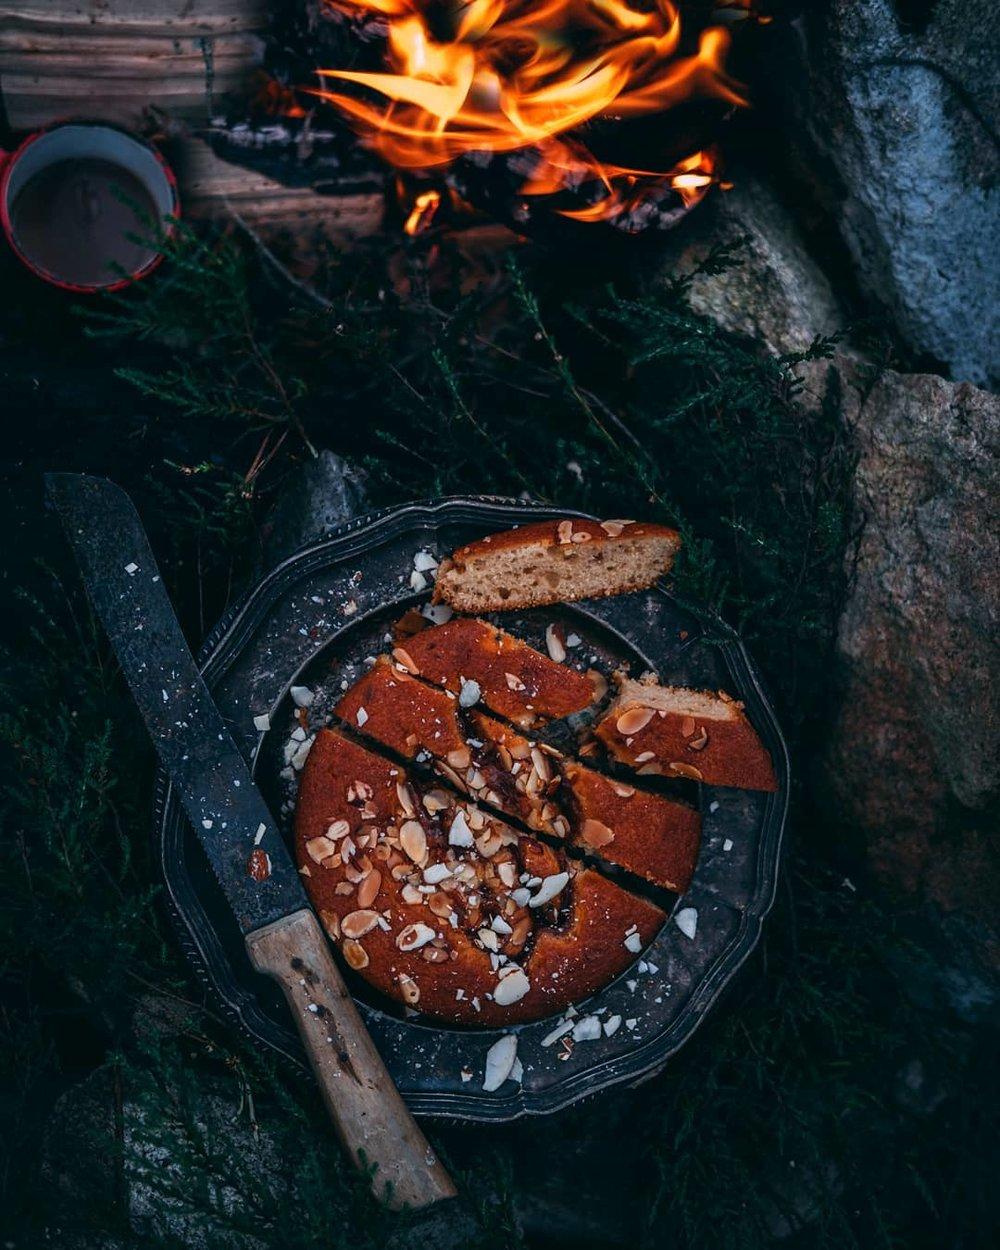 matfoto i skogen mats dreyer fotograf